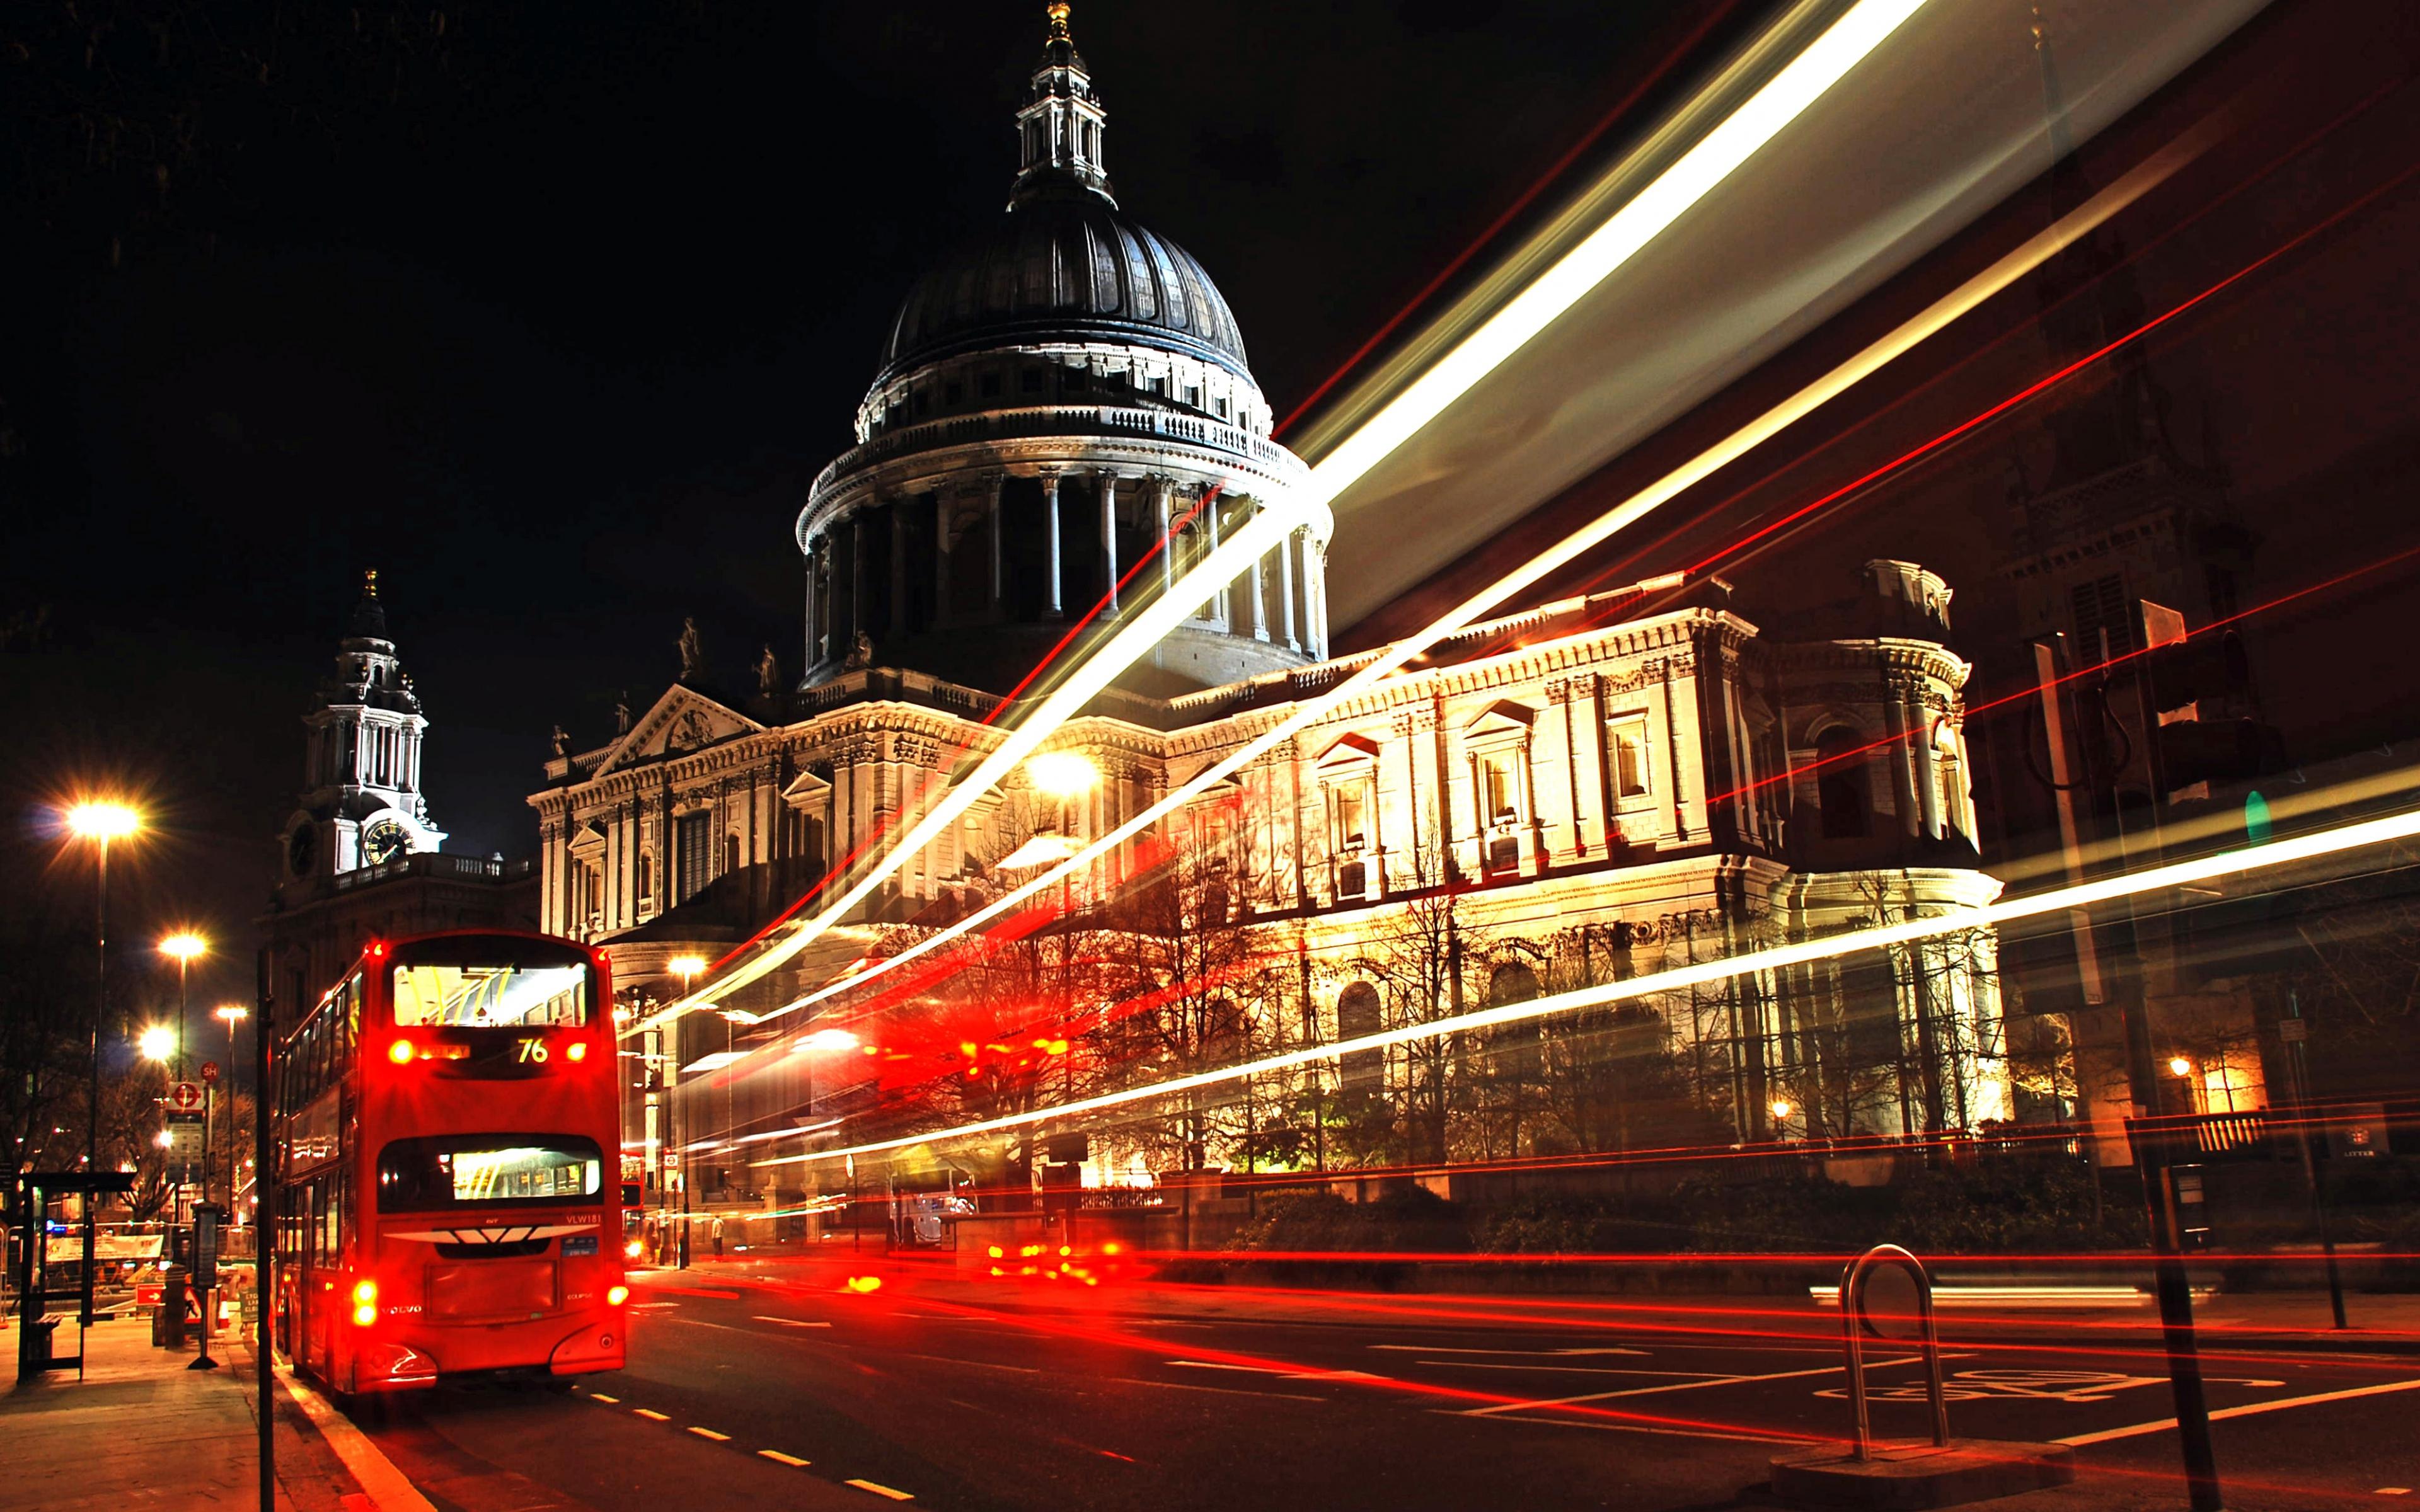 Wallpaper 3840x2400 london city bus night Ultra HD 4K HD Background 3840x2400